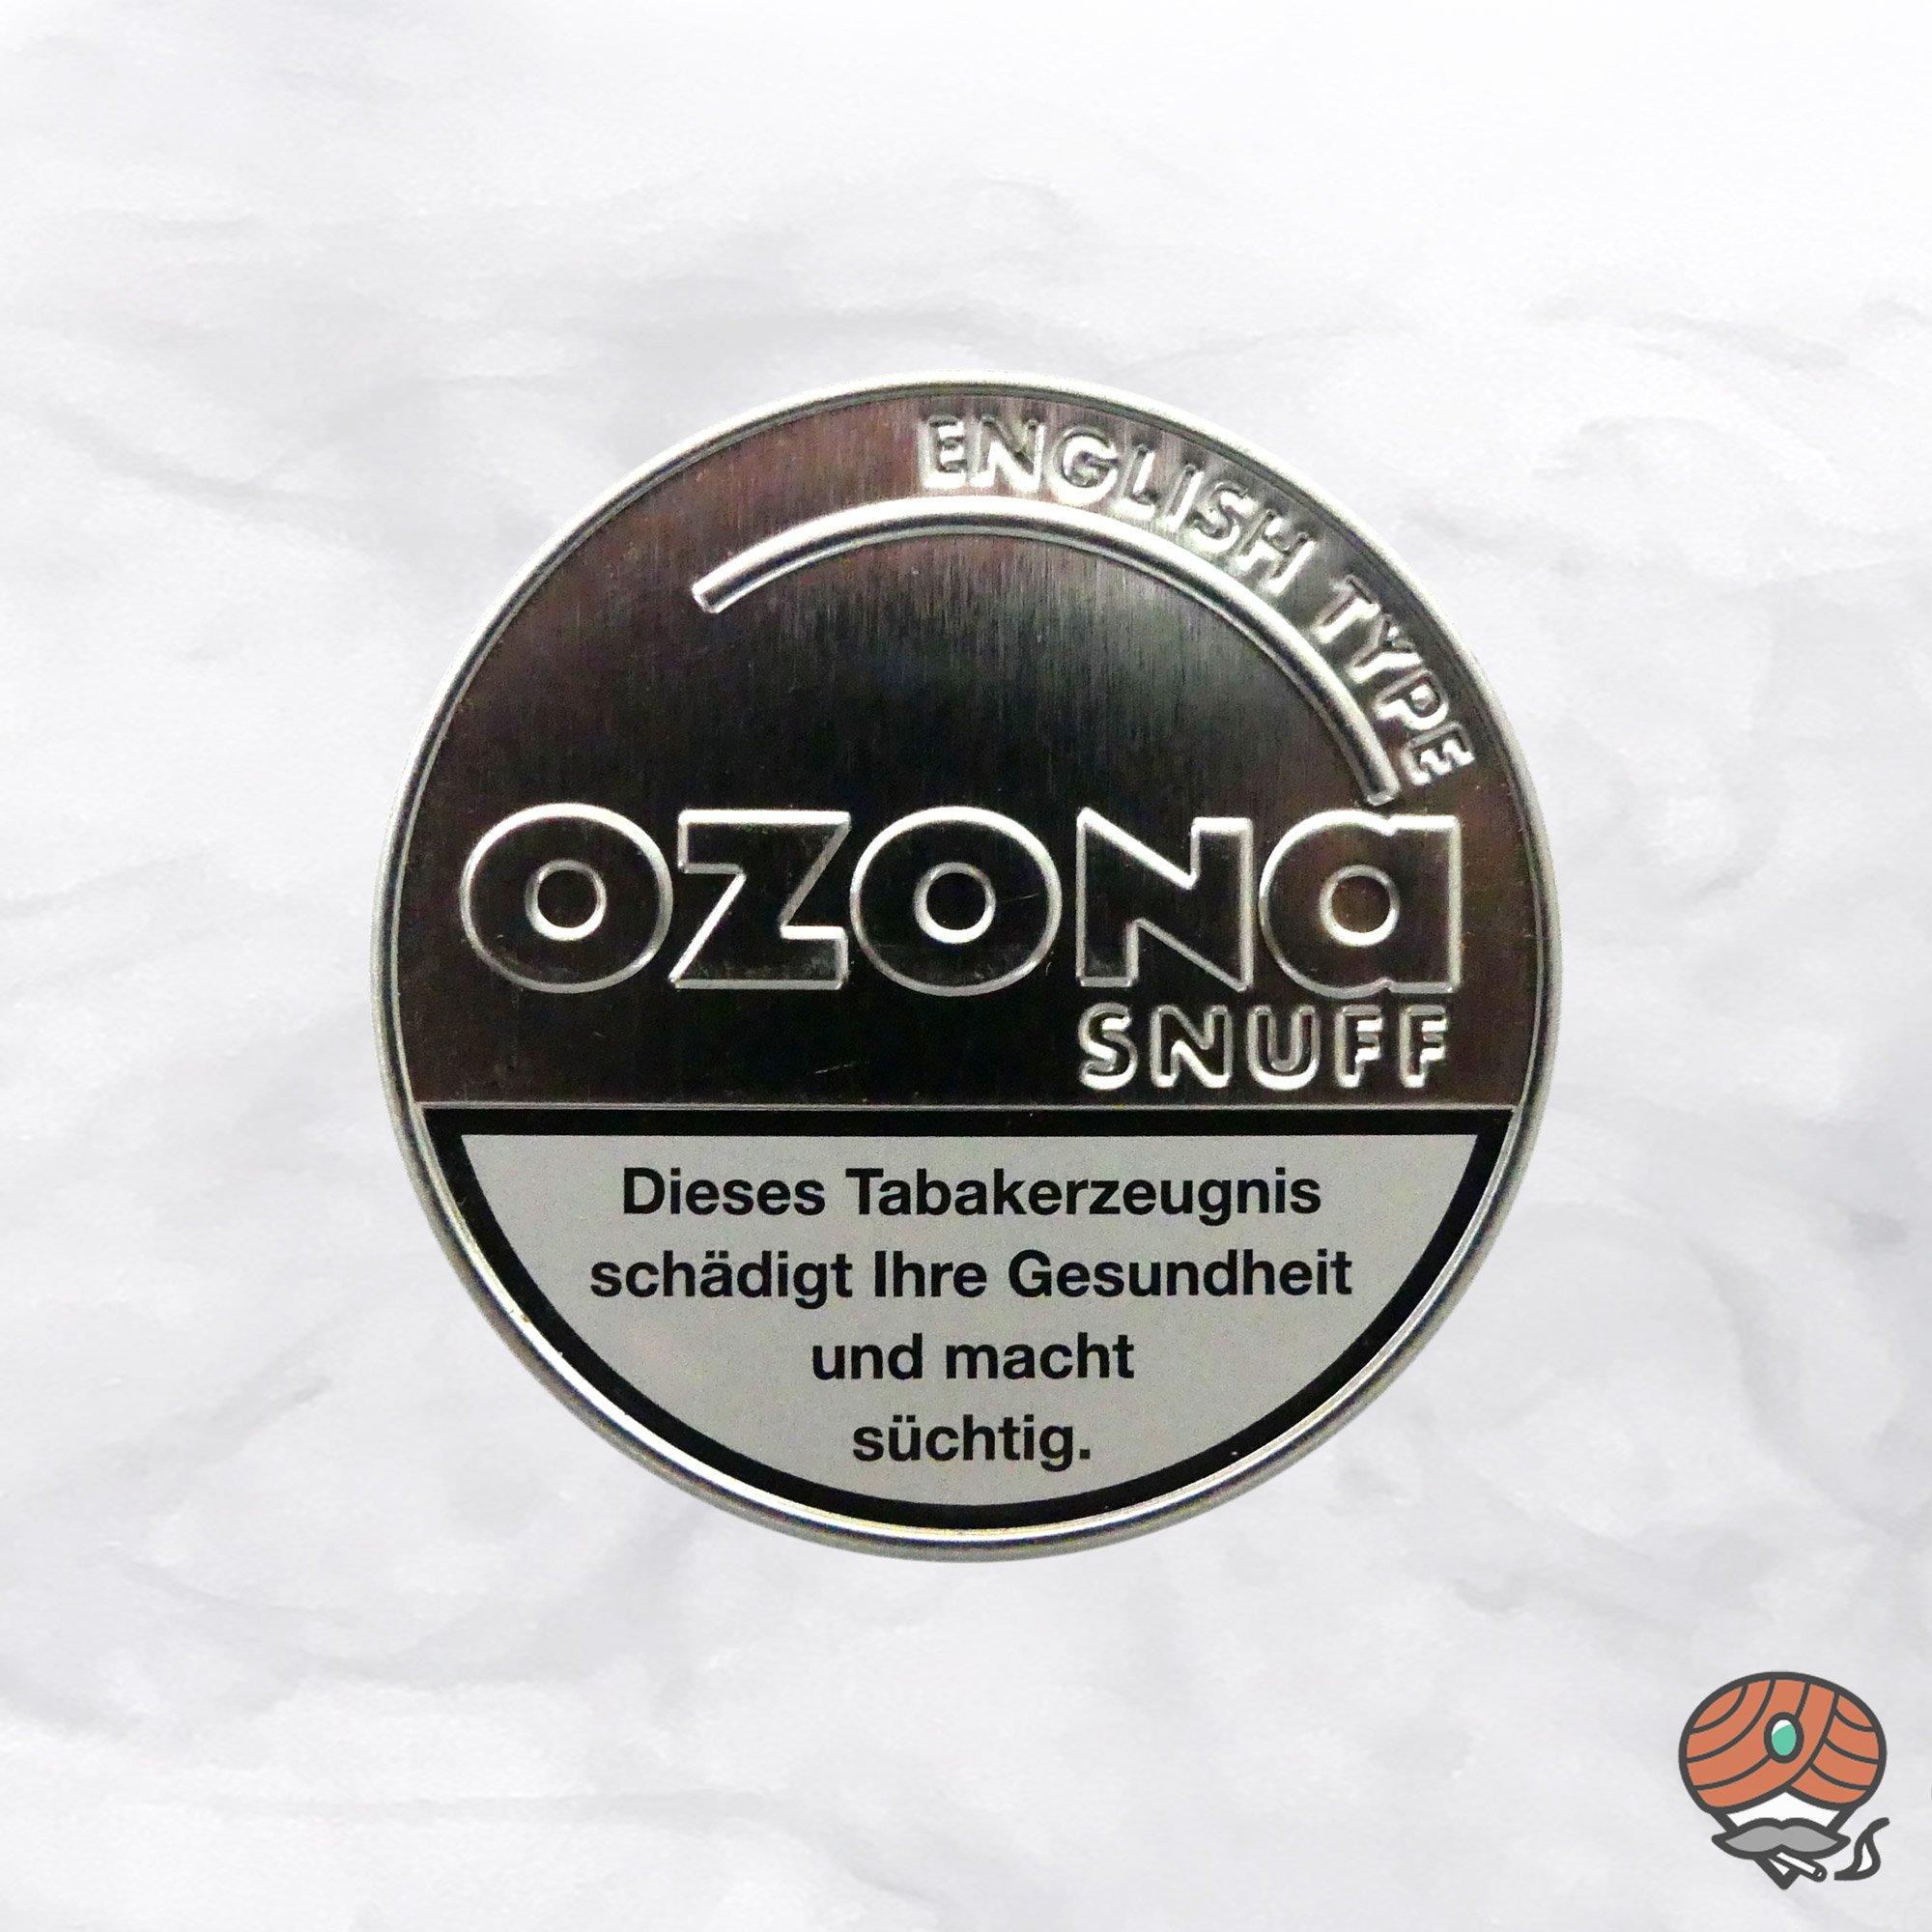 Ozona ENGLISH TYPE Snuff Schnupftabak 5g